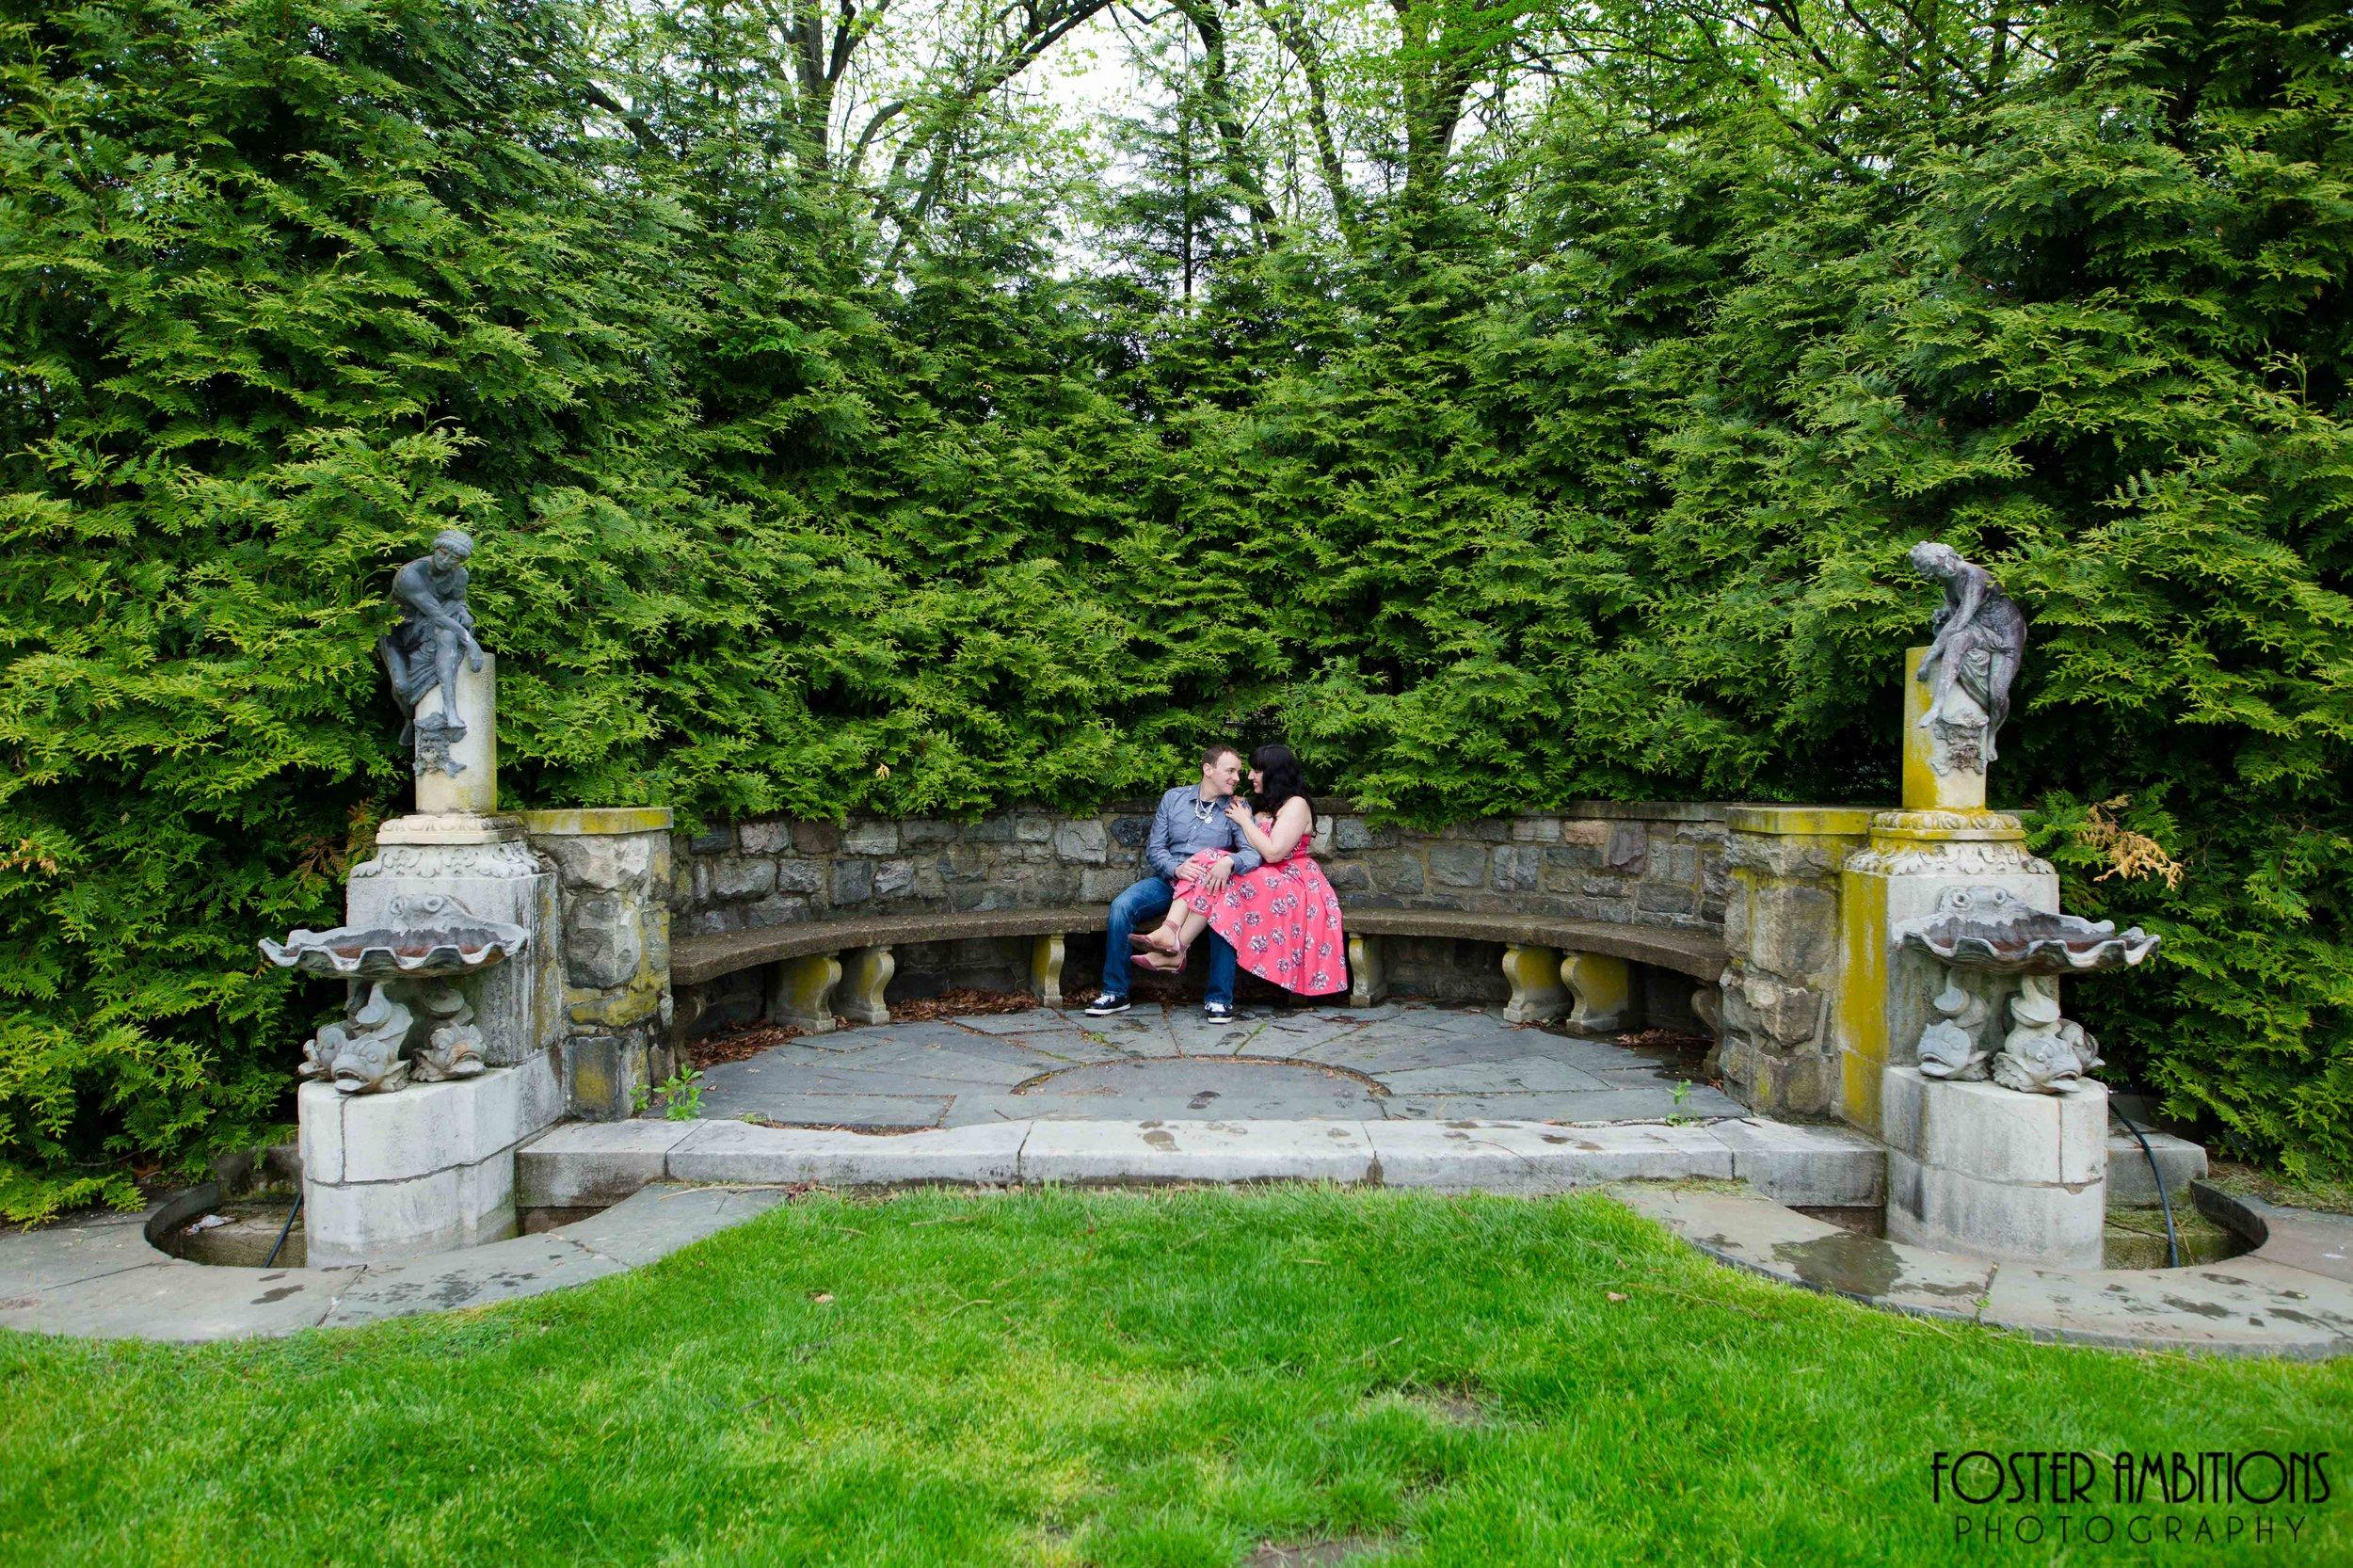 NJ Botanical Gardens Skylands Manor-Foster Ambitions Photography.JPG